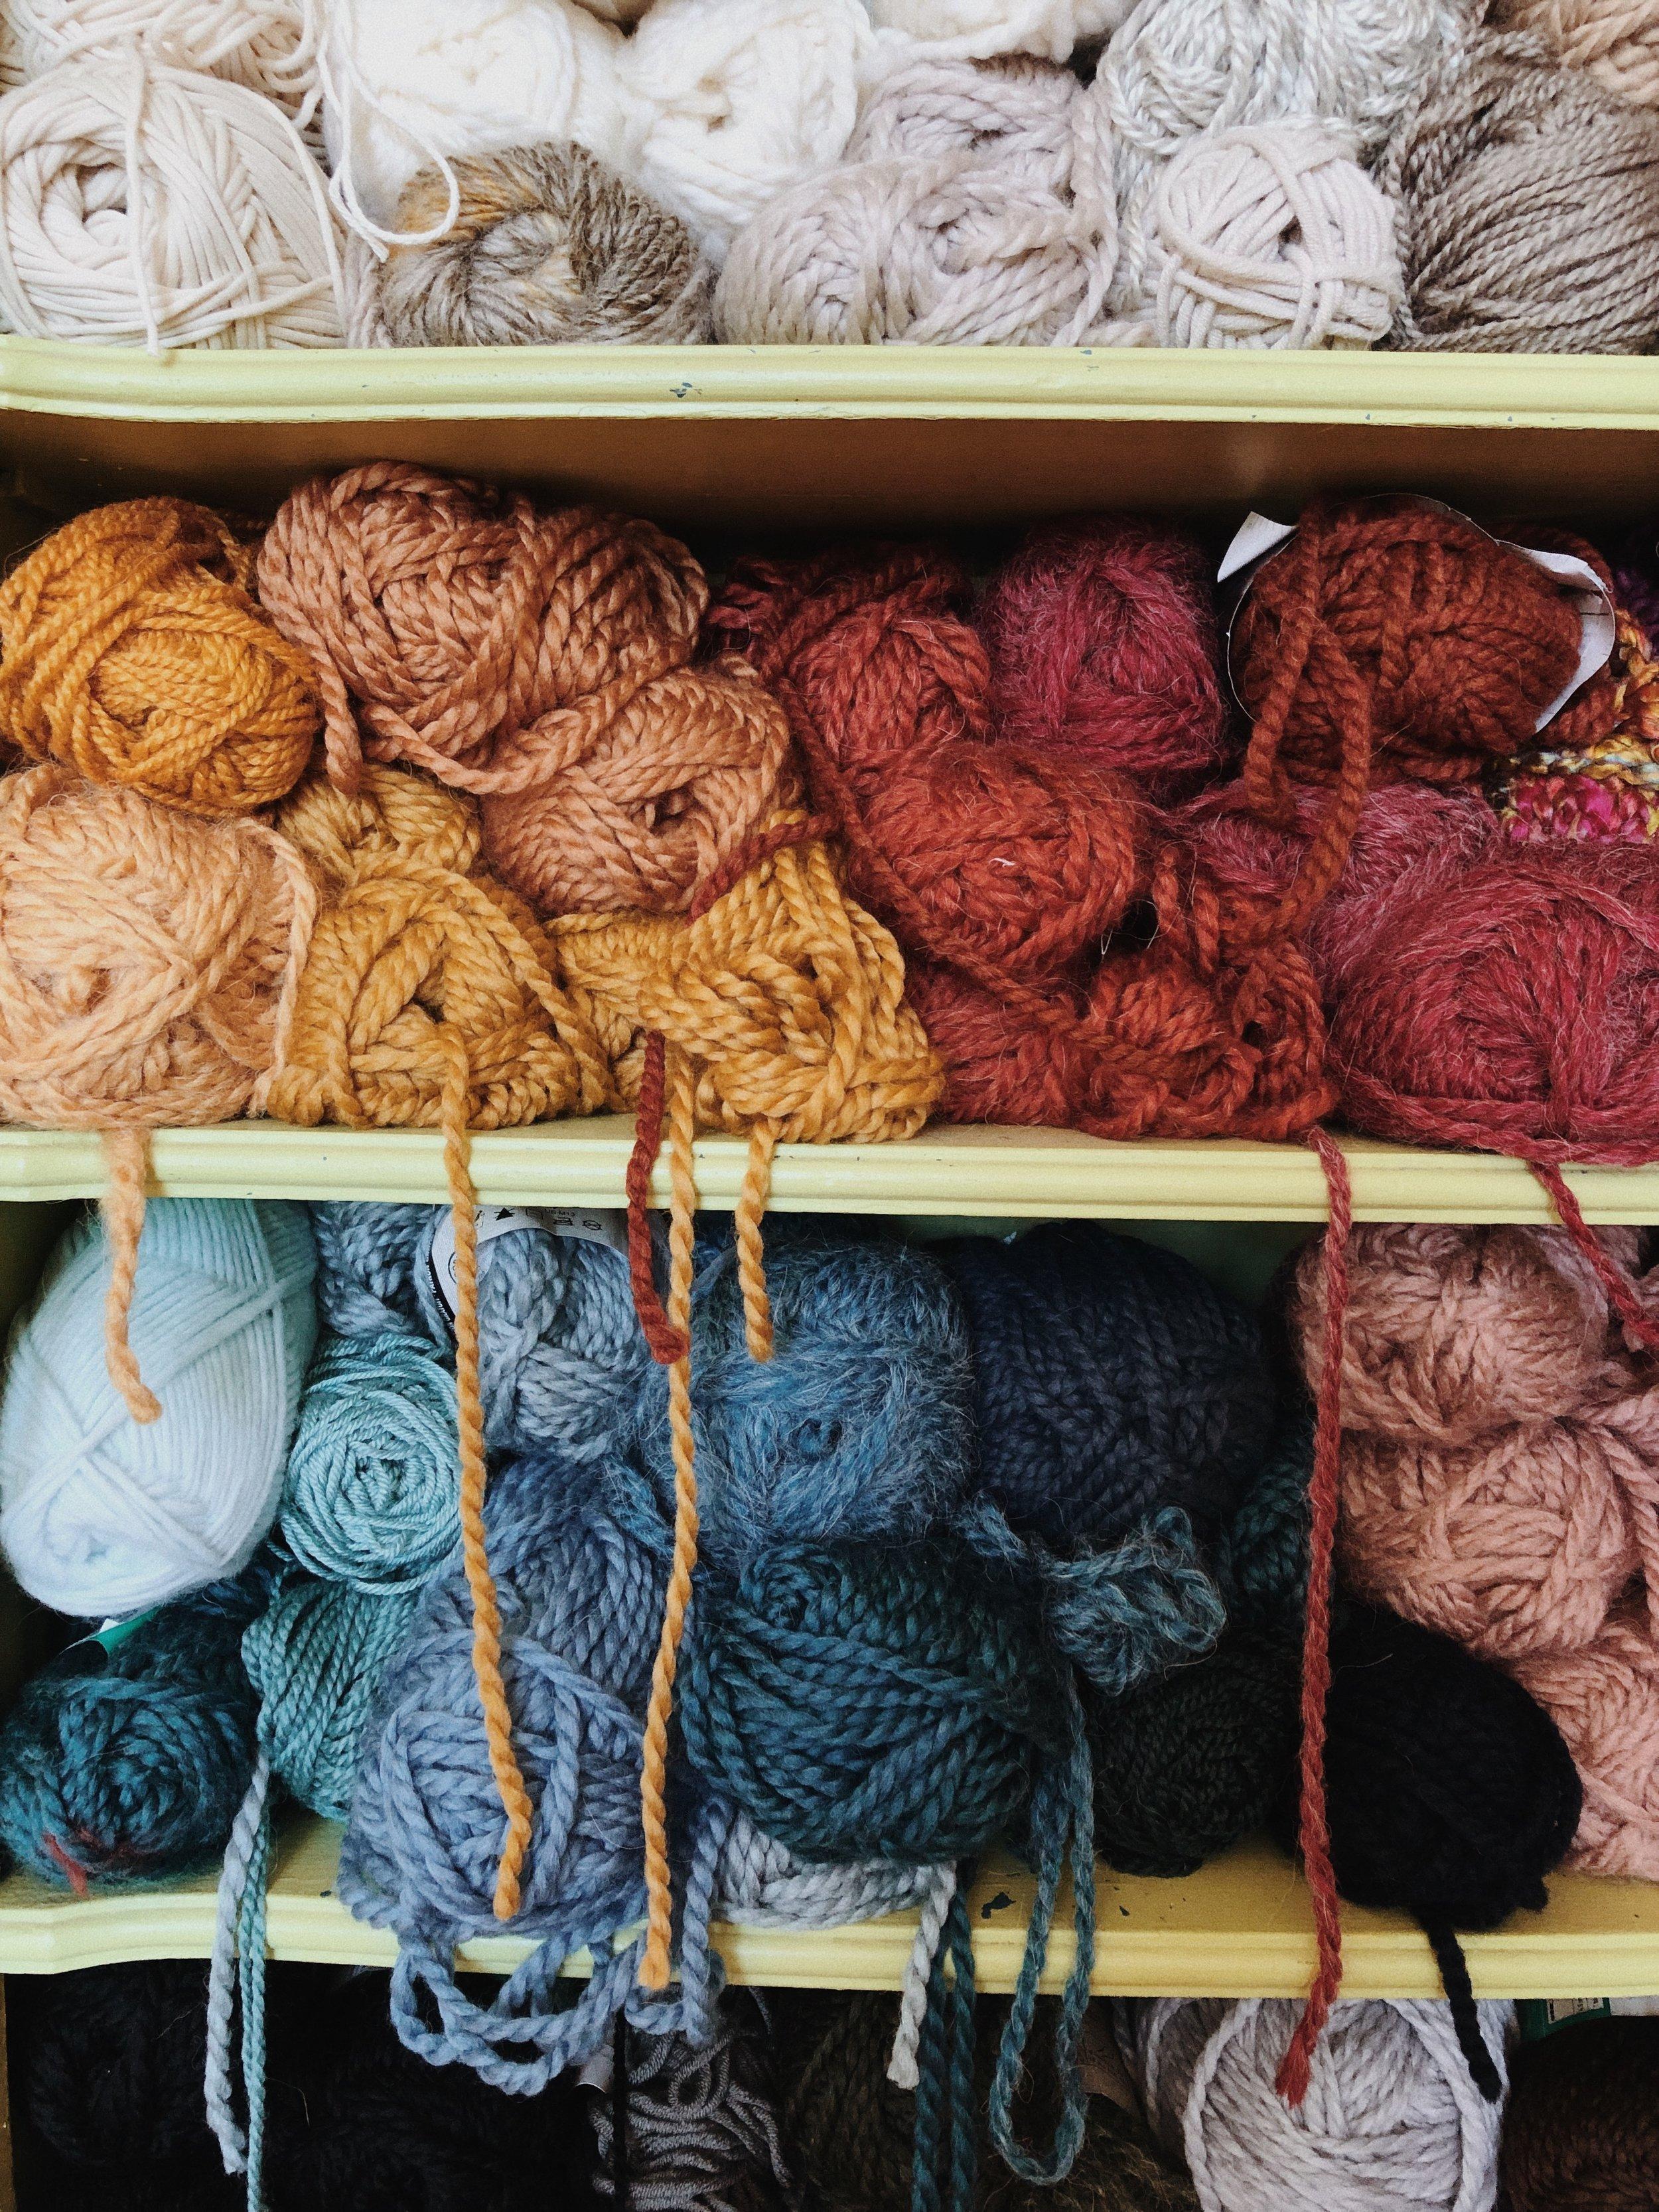 Colorful Yarn stash in my living room sewing studio.